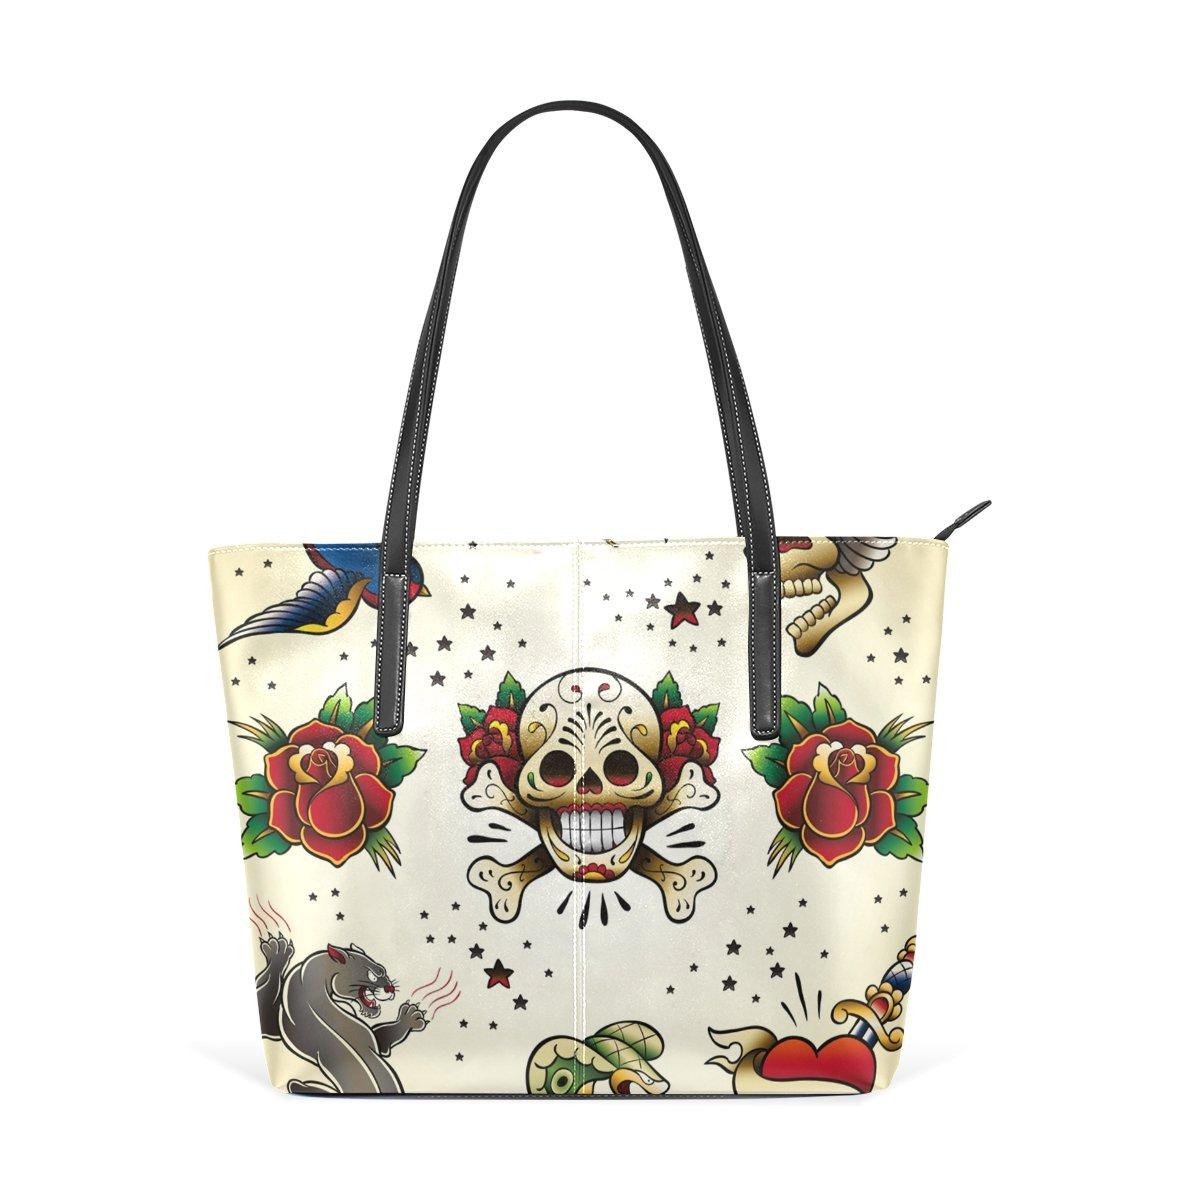 Womens Leather Top Handle Shoulder Handbag Art Large Work Tote Bag